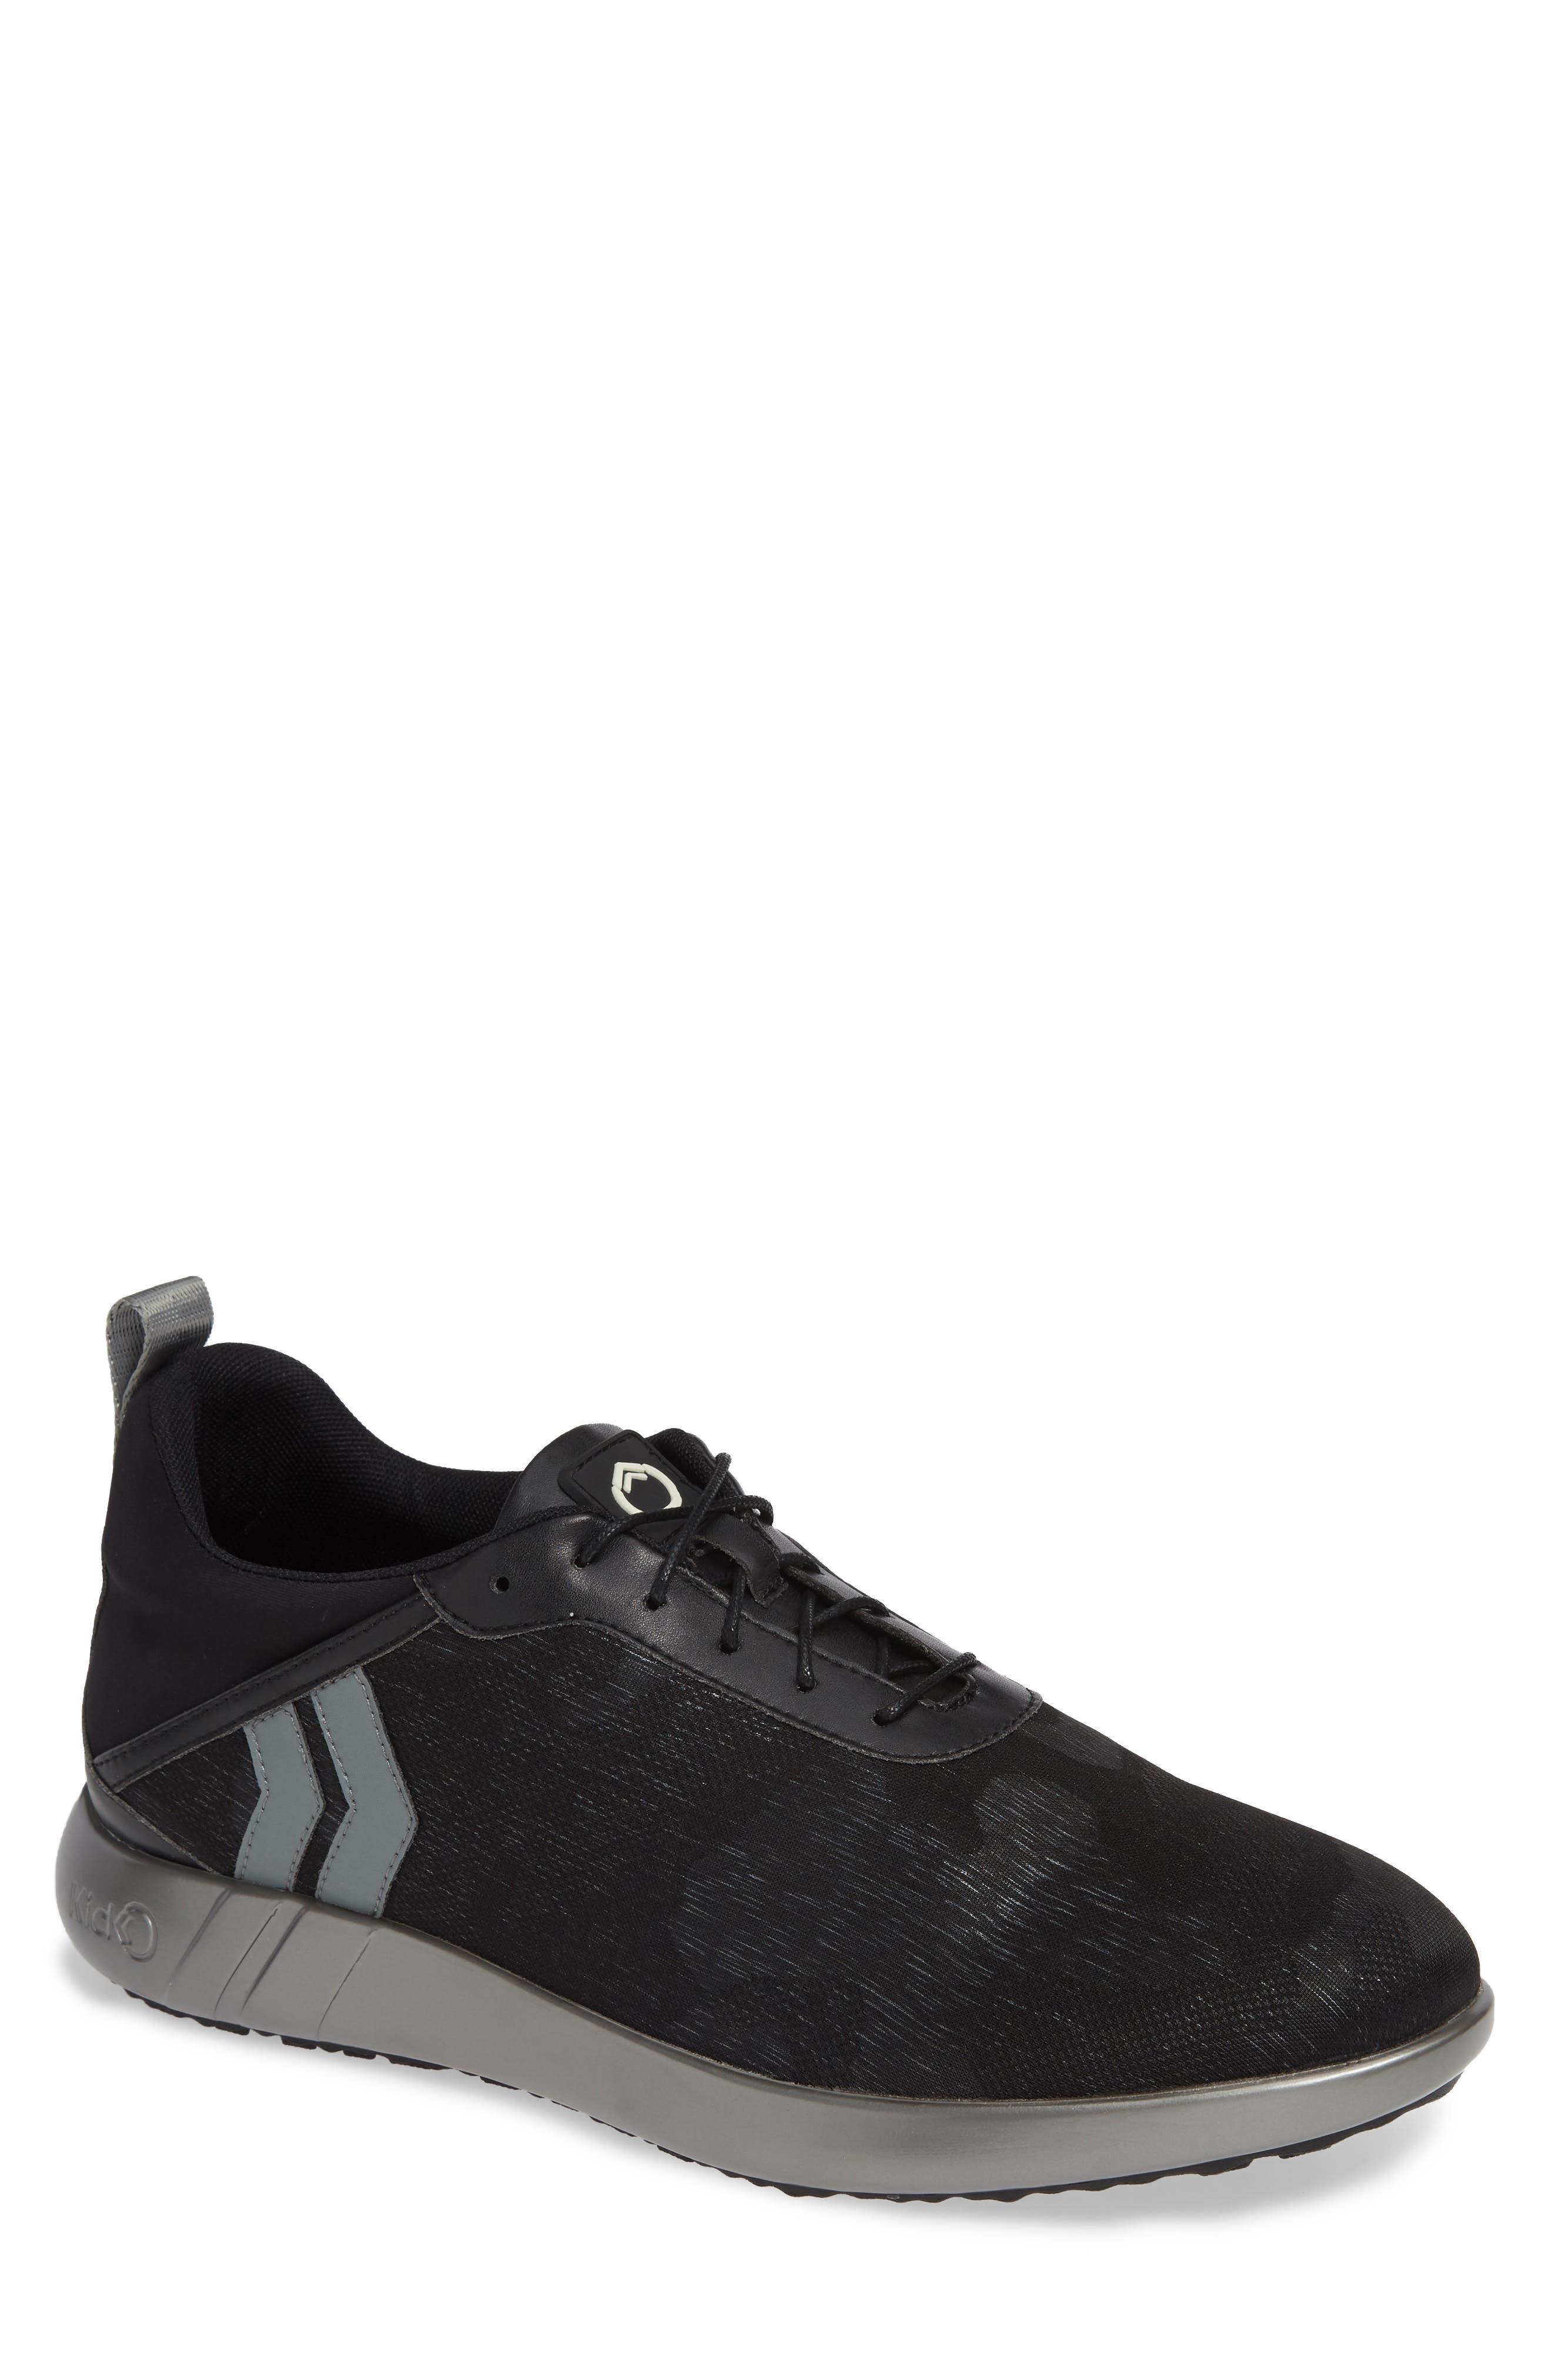 Haze Sneaker,                             Main thumbnail 1, color,                             021